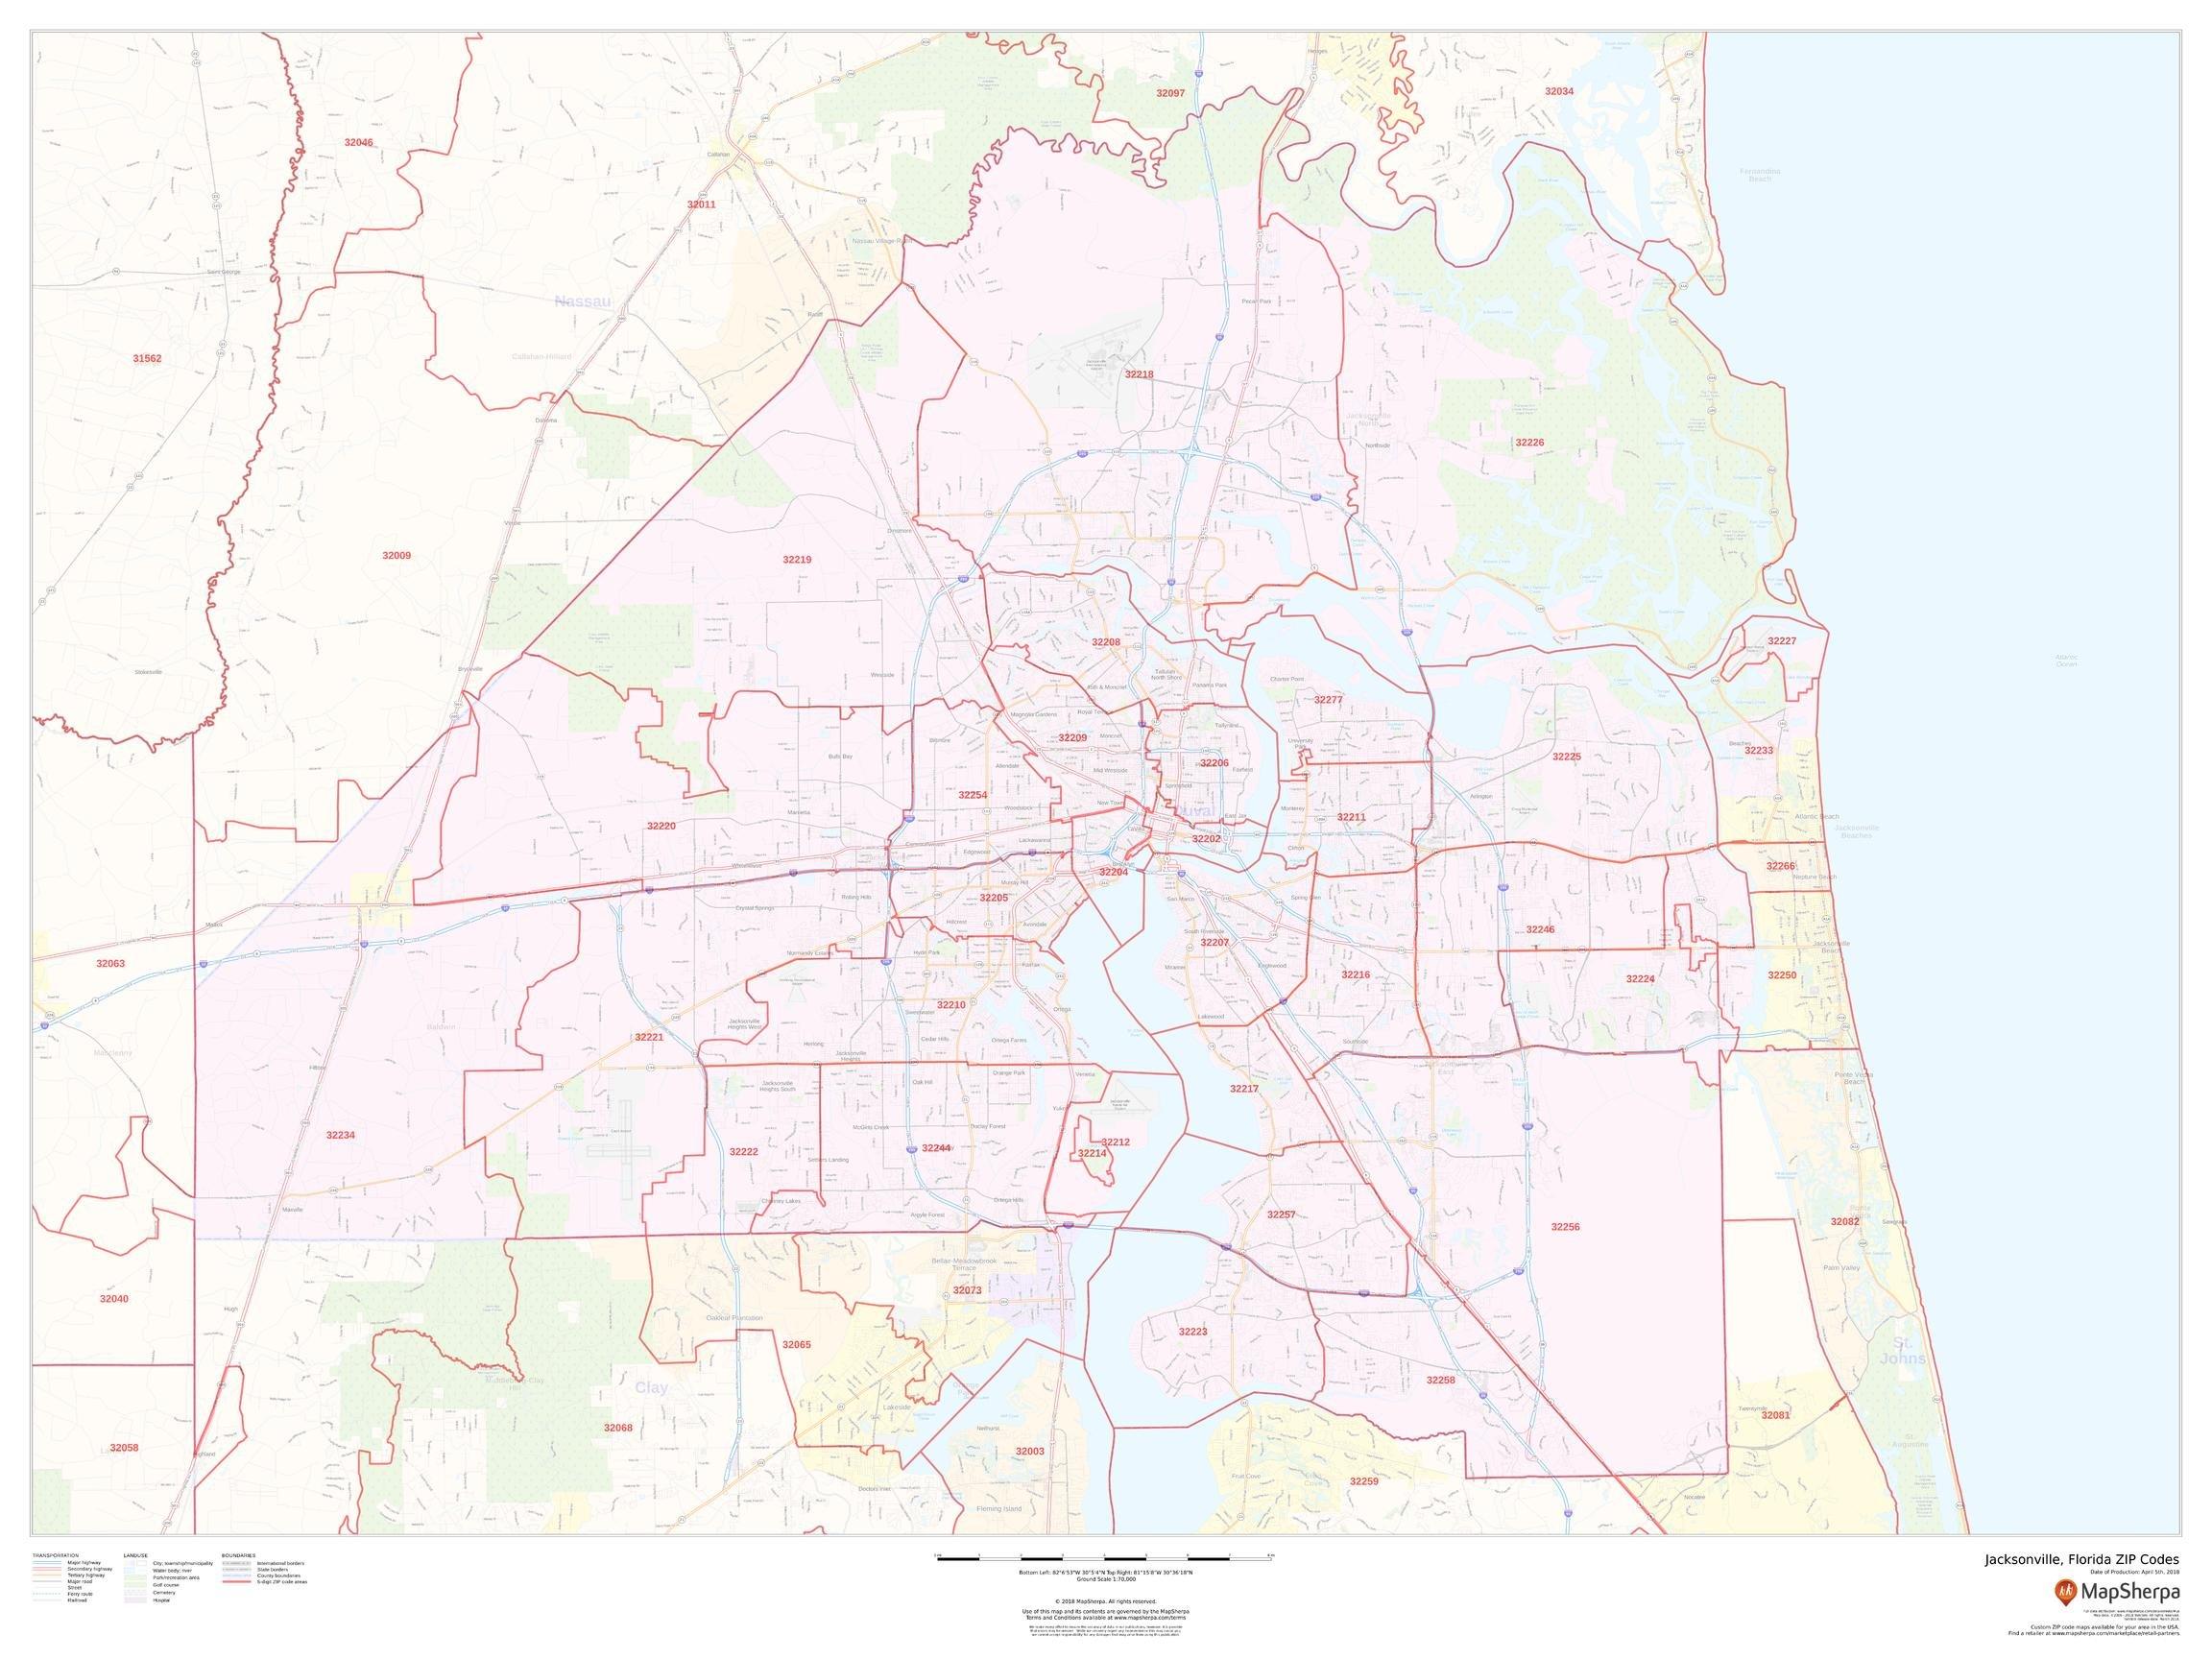 Jacksonville, Florida Zip Codes - 48'' x 36'' Laminated Wall Map